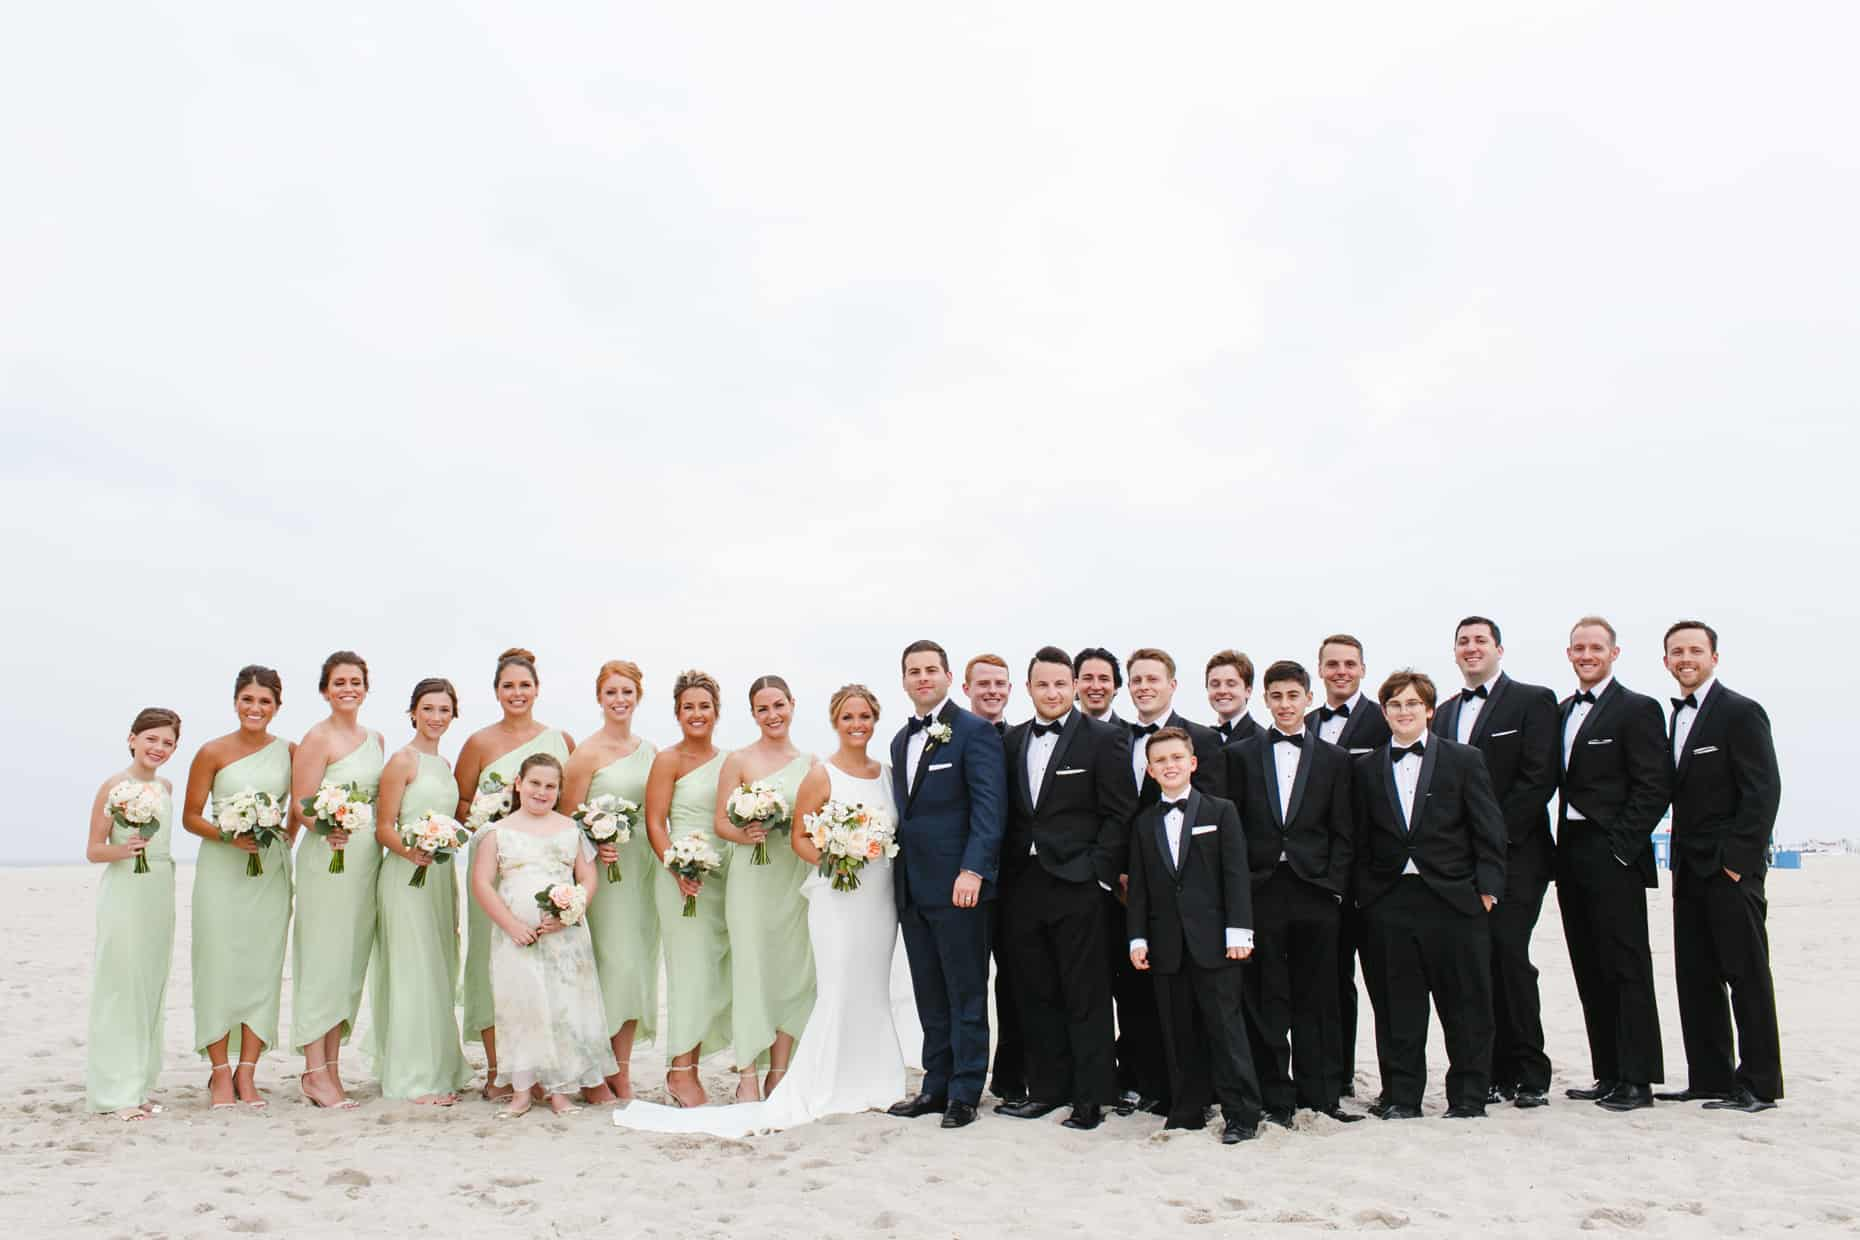 New Jersey Beach wedding photos